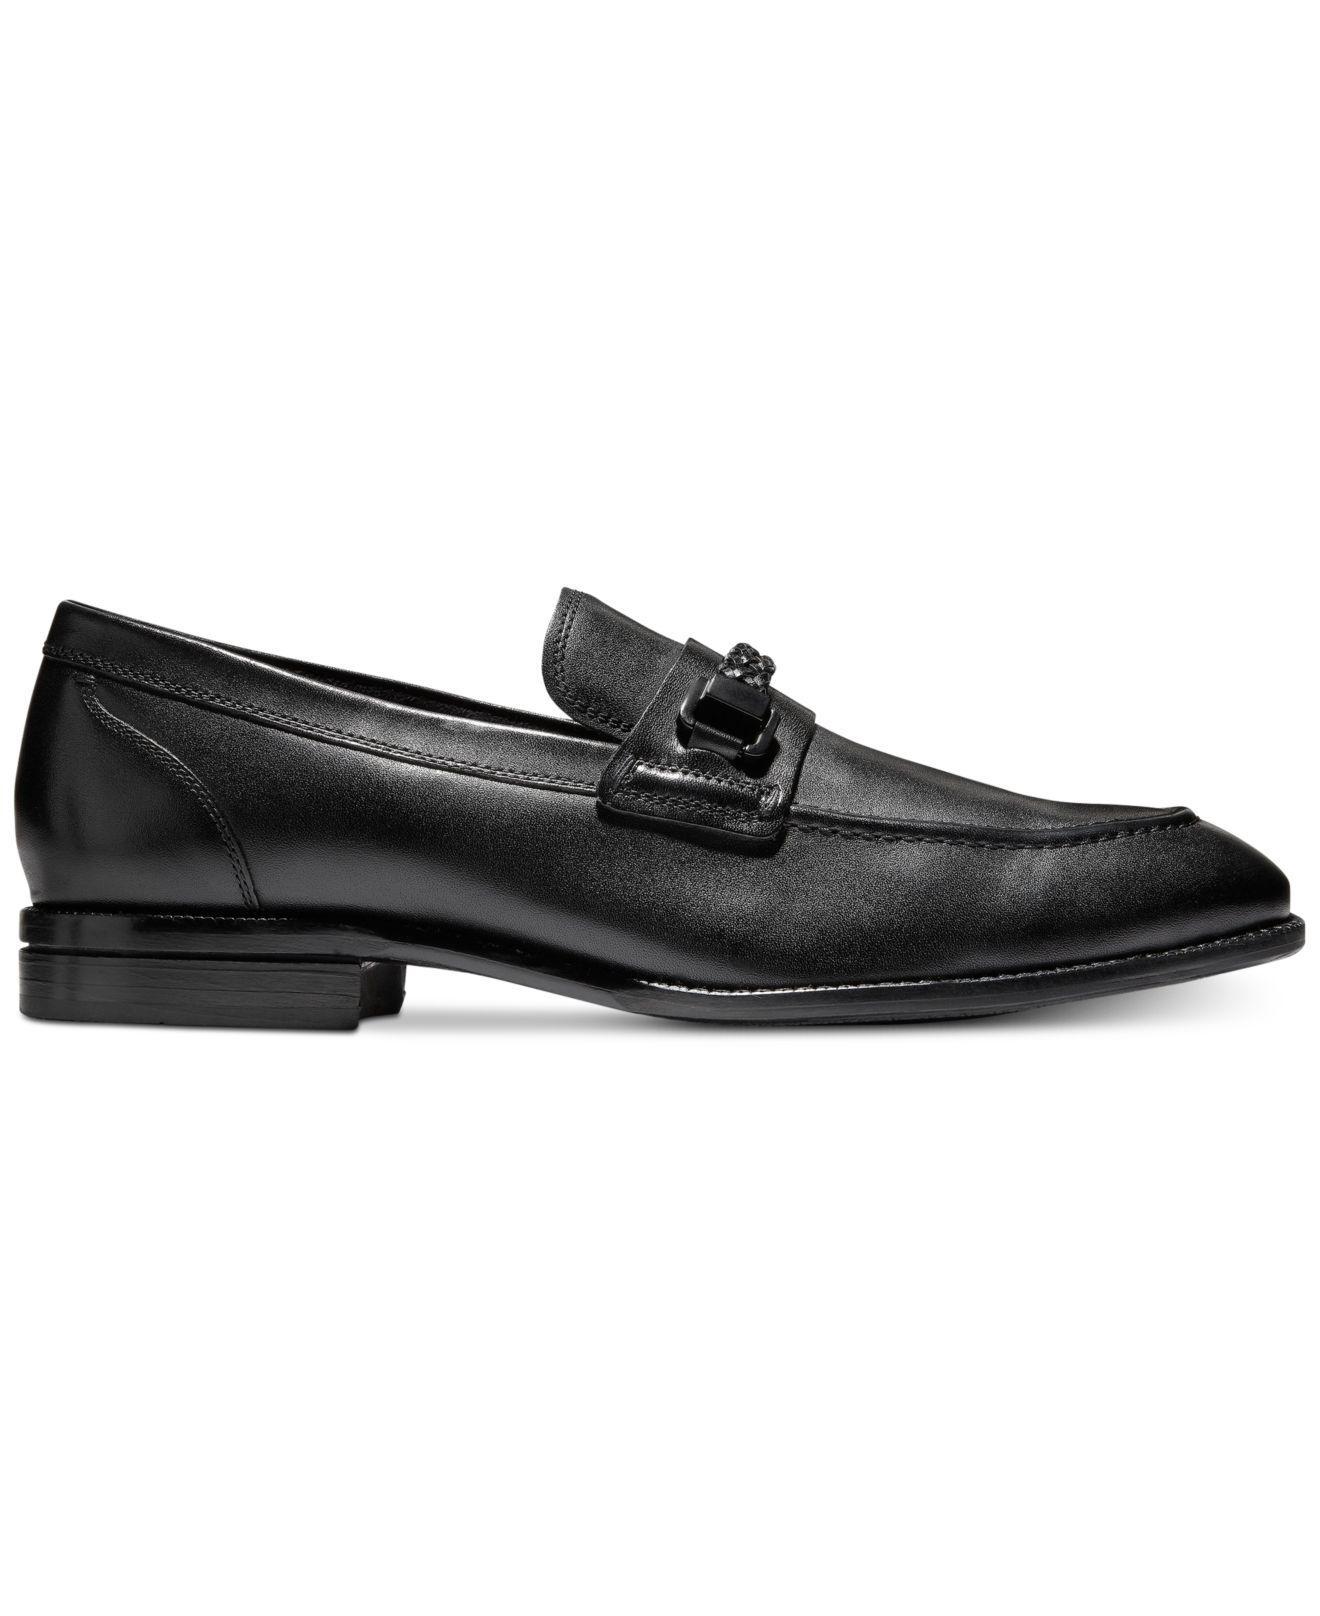 2c9af74e933 Lyst - Cole Haan Williams 2.0 Grand Bit Loafers in Black for Men